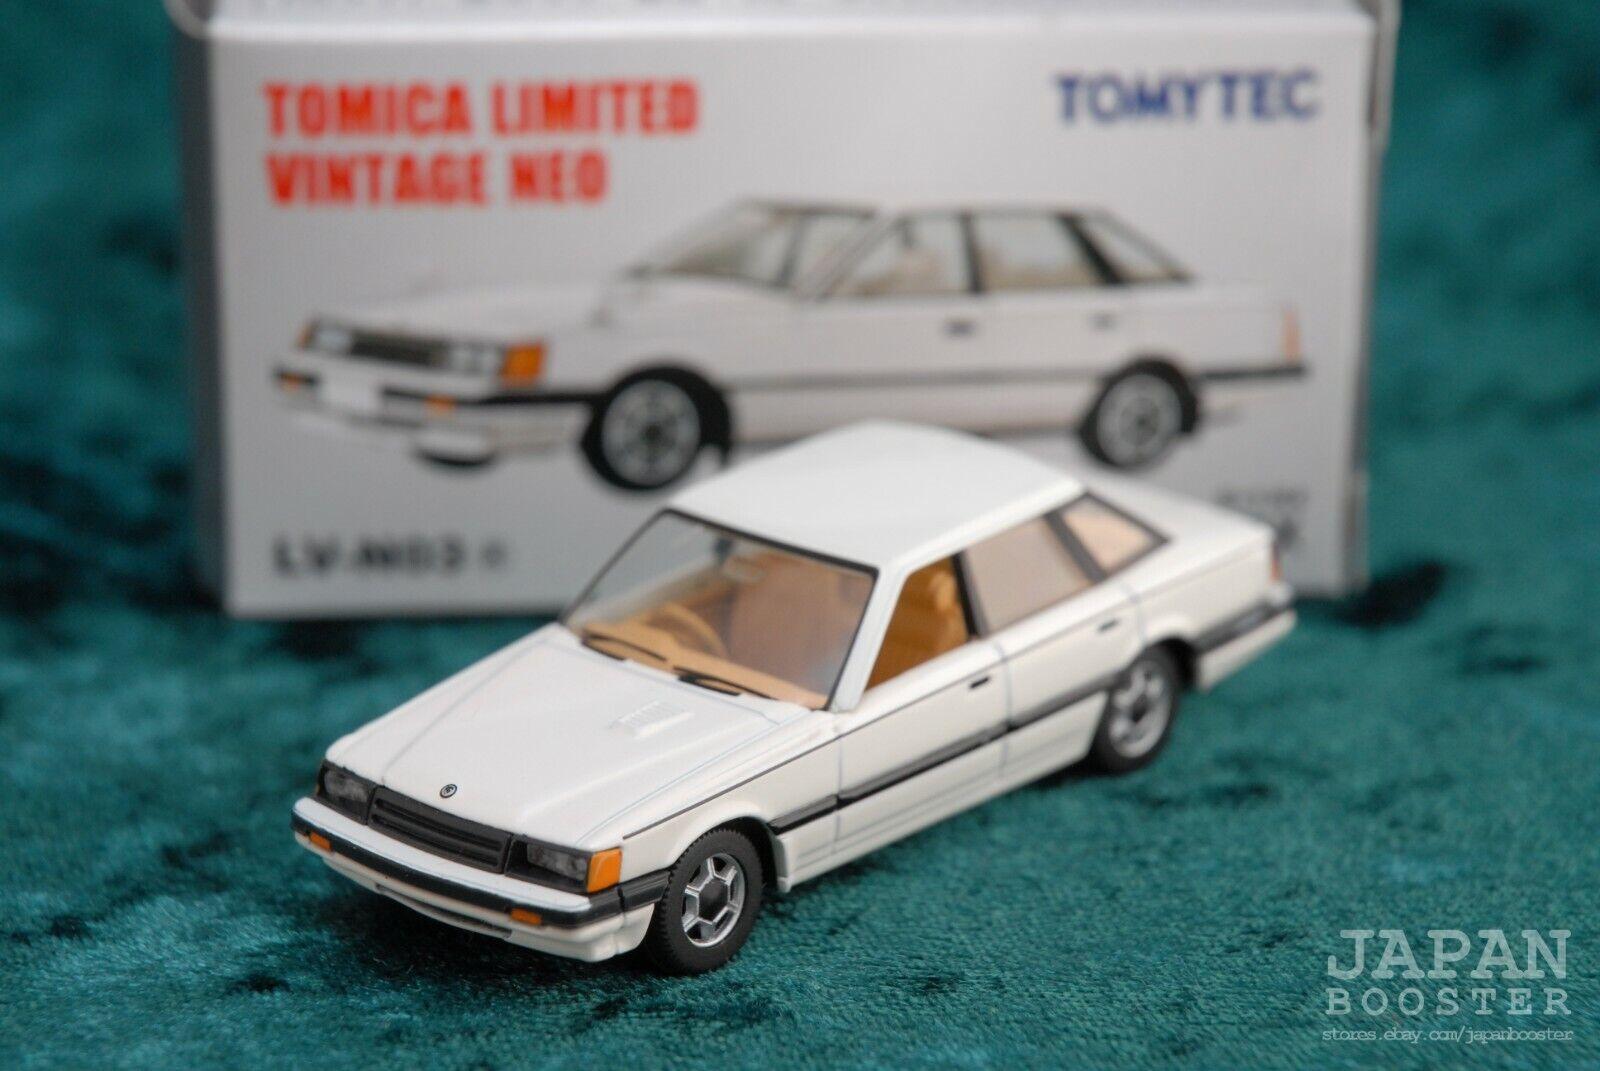 Tomica Limited Vintage Neo Lv N03a Nissan Leopard Tr X White For Sale Online Ebay